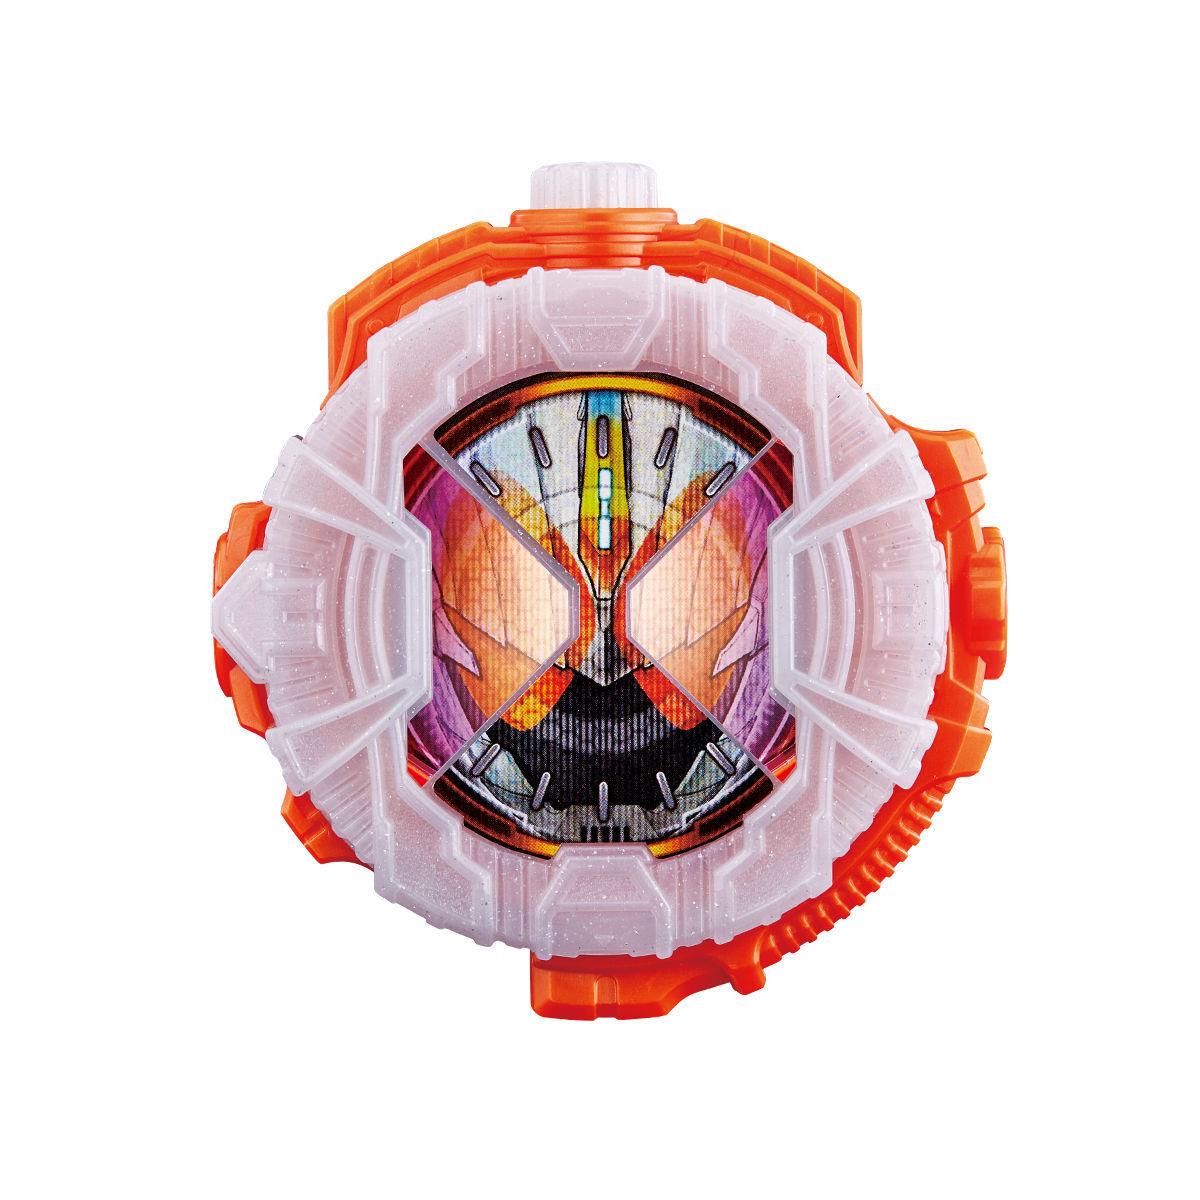 Kamen Rider ZI-O DX Drive Drive Drive type TRIDERON Triedlon & Ghost Mugen Soul Ride Watch 747880